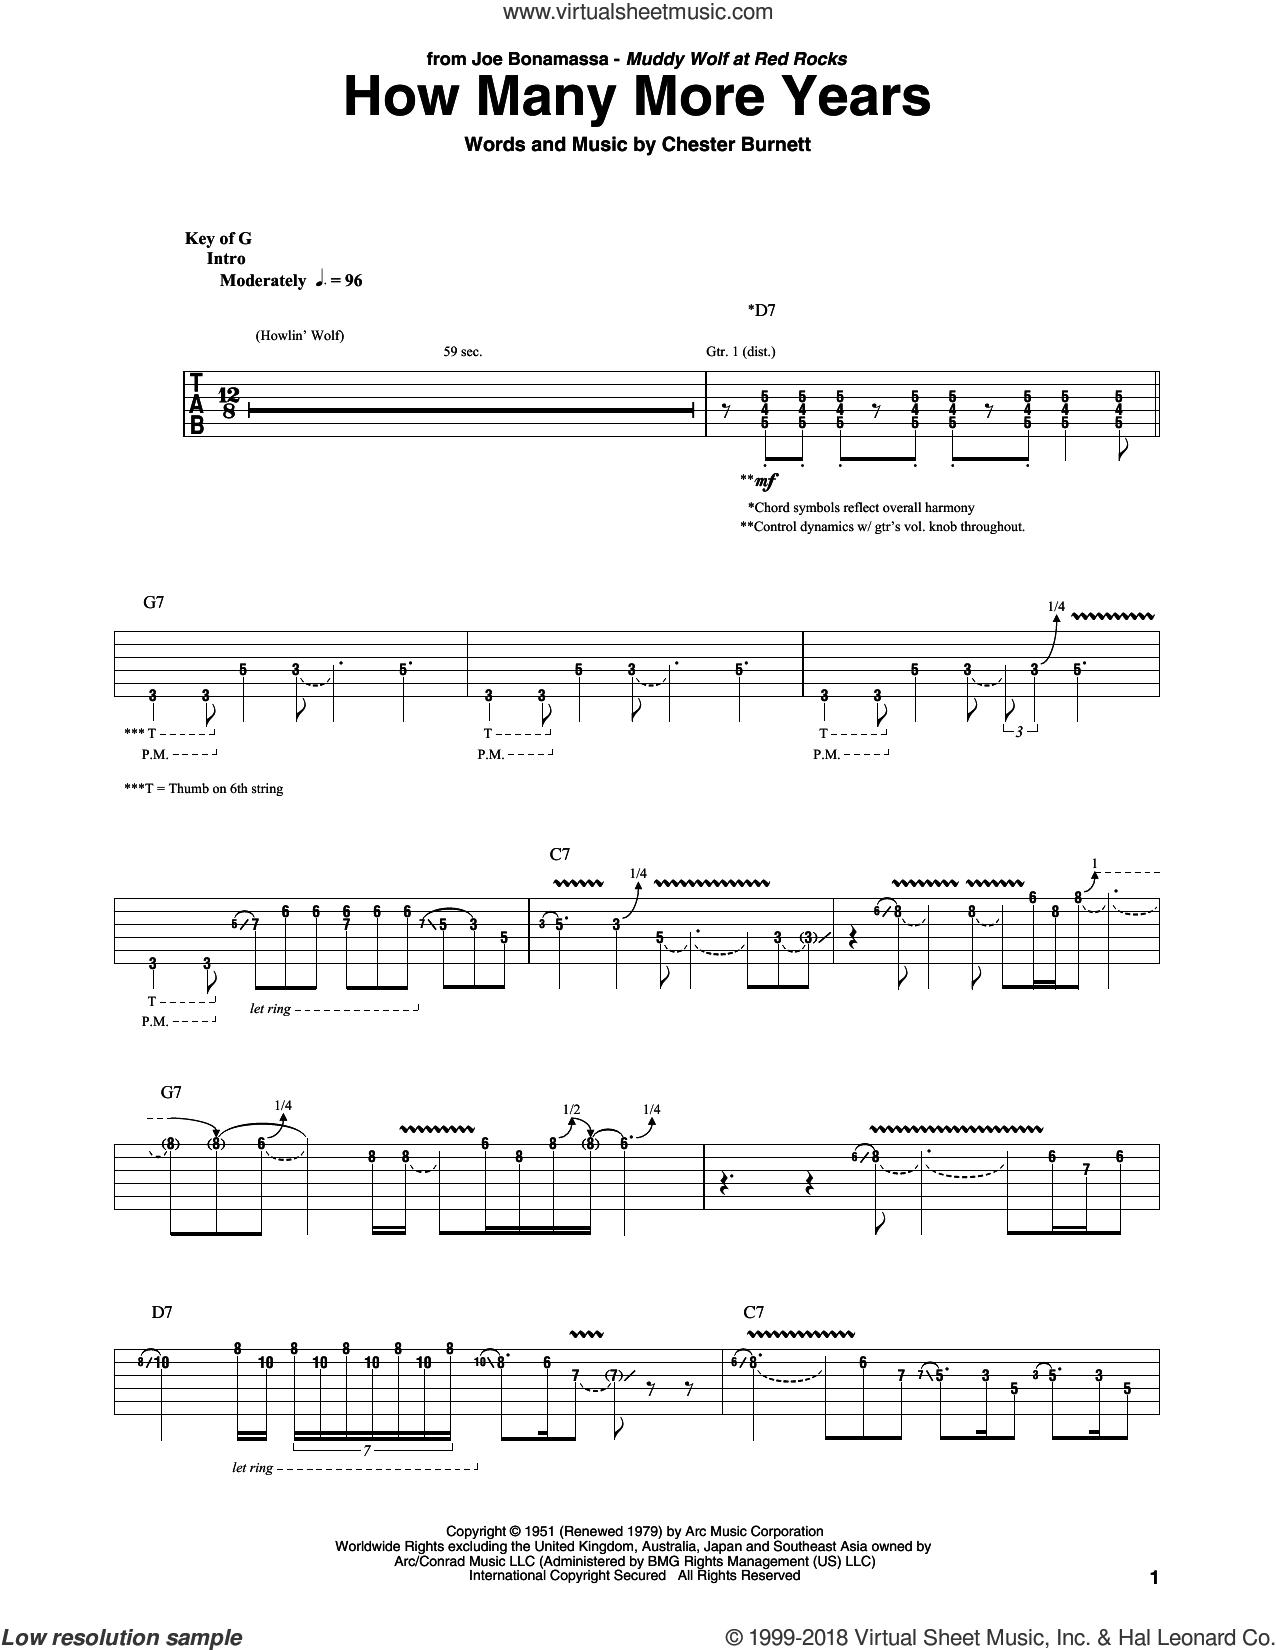 How Many More Years sheet music for guitar (rhythm tablature) by Joe Bonamassa and Chester Burnett, intermediate skill level